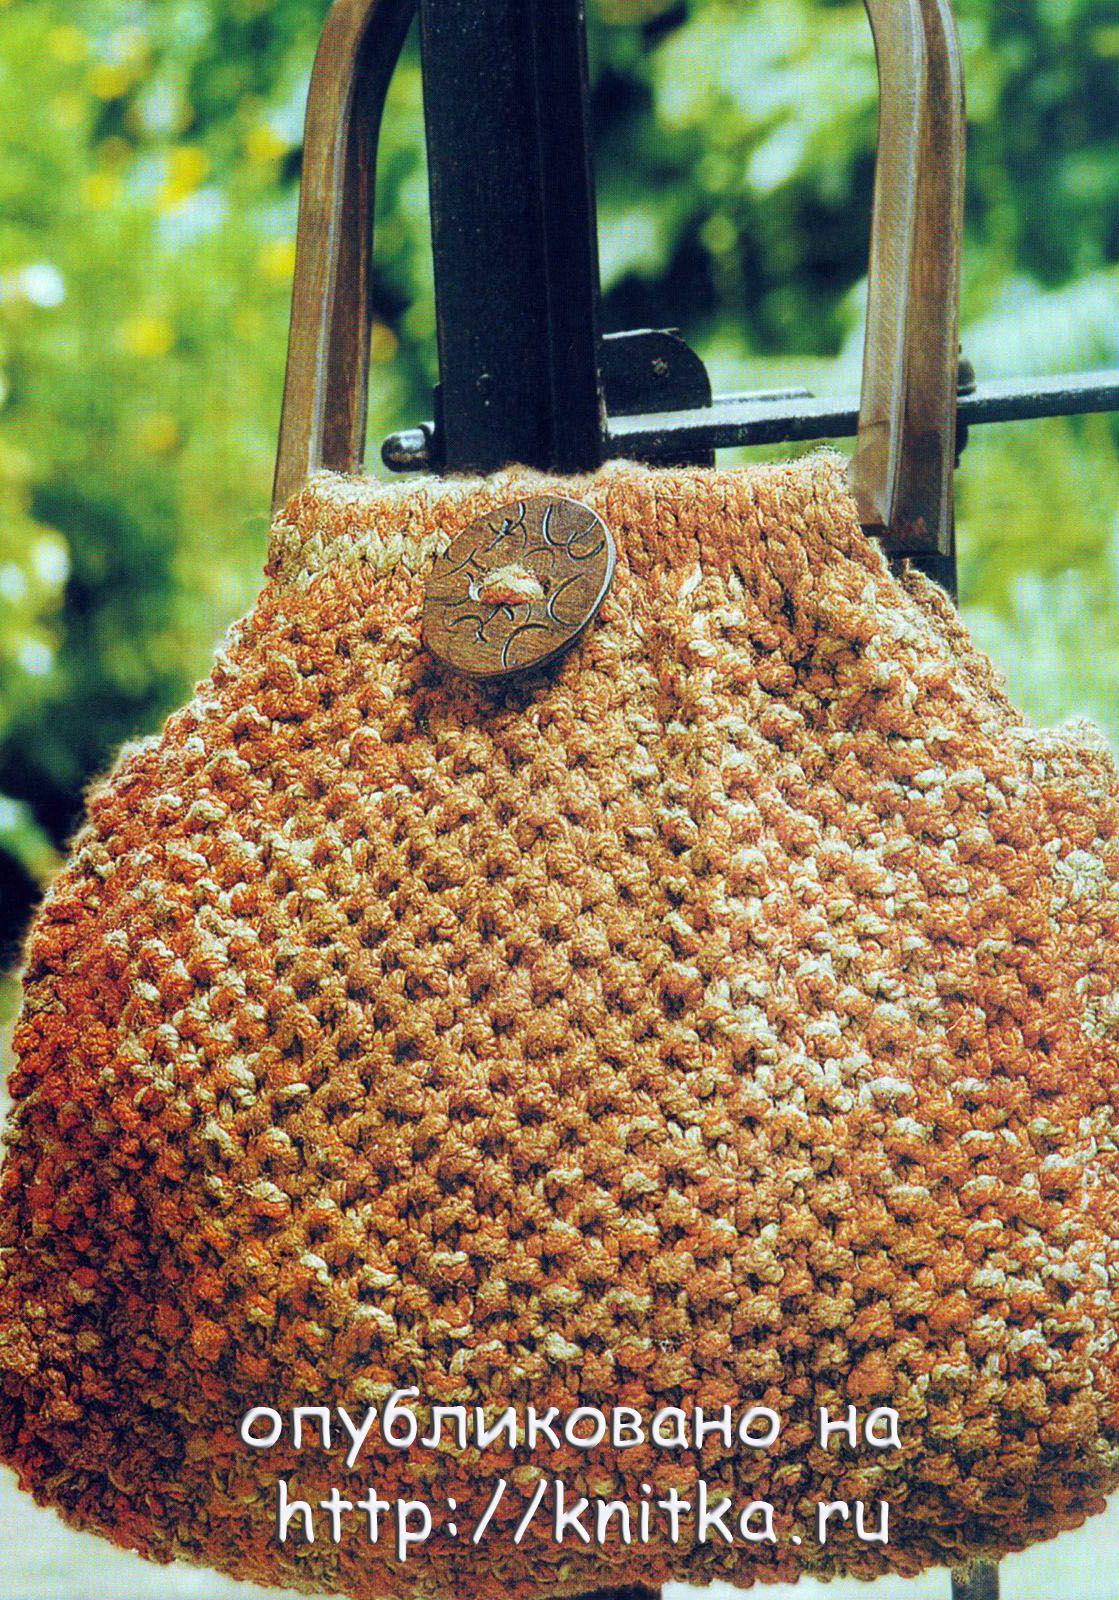 В'язана сумка з дерев'яними ручками